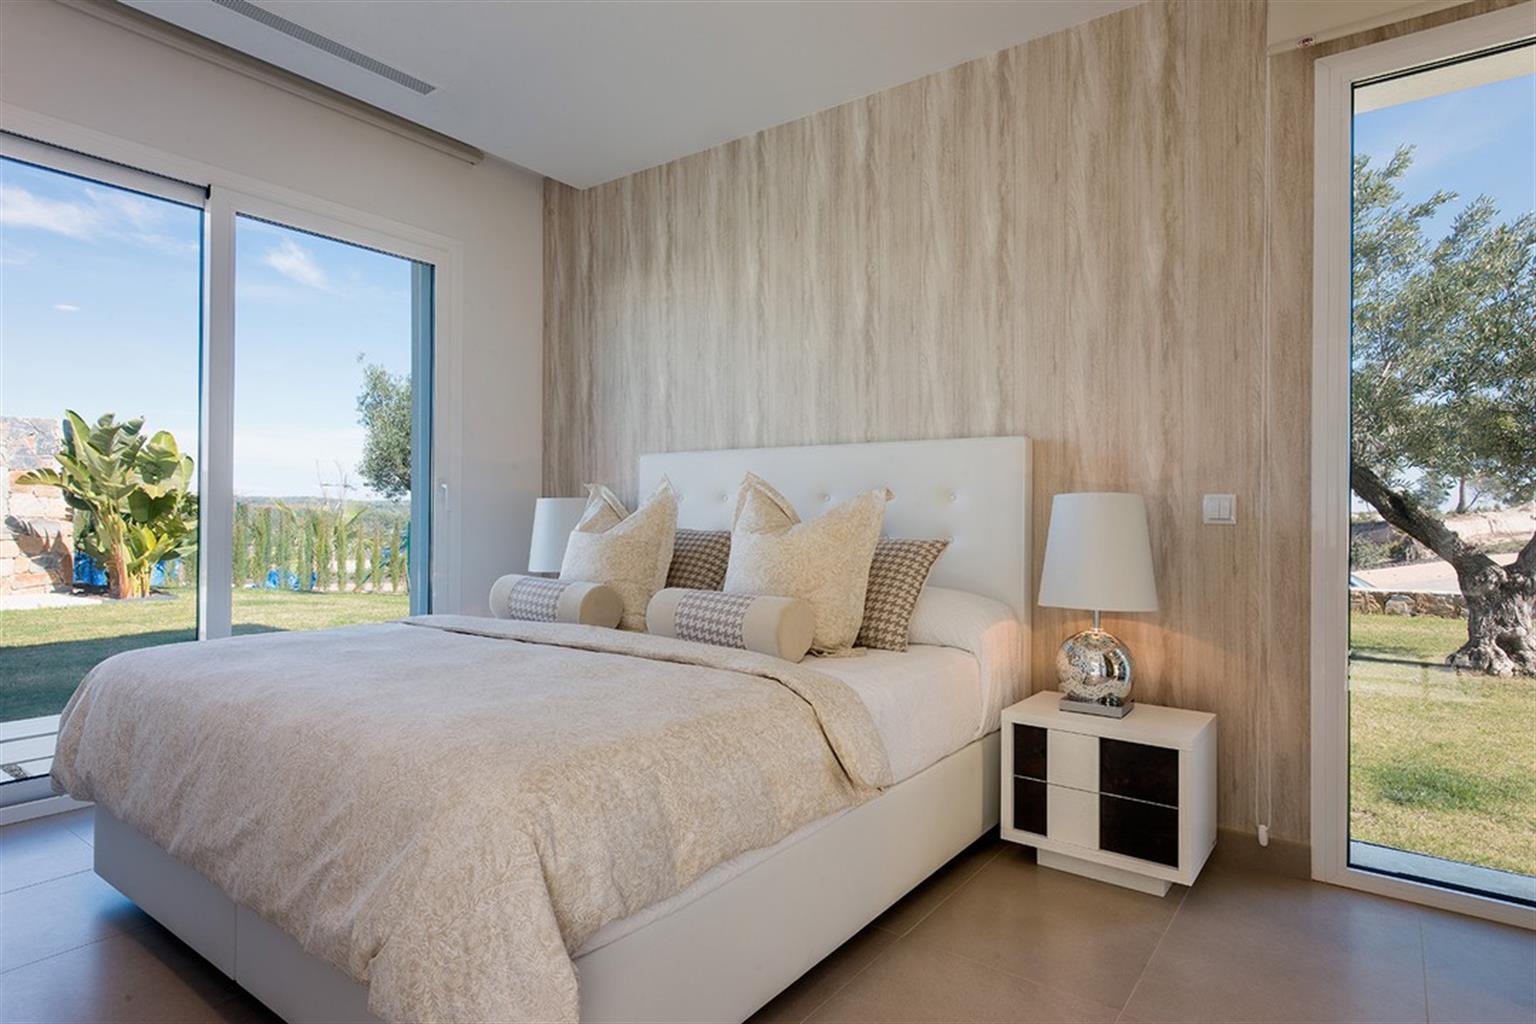 Maison - Villamartin - #4228155-19